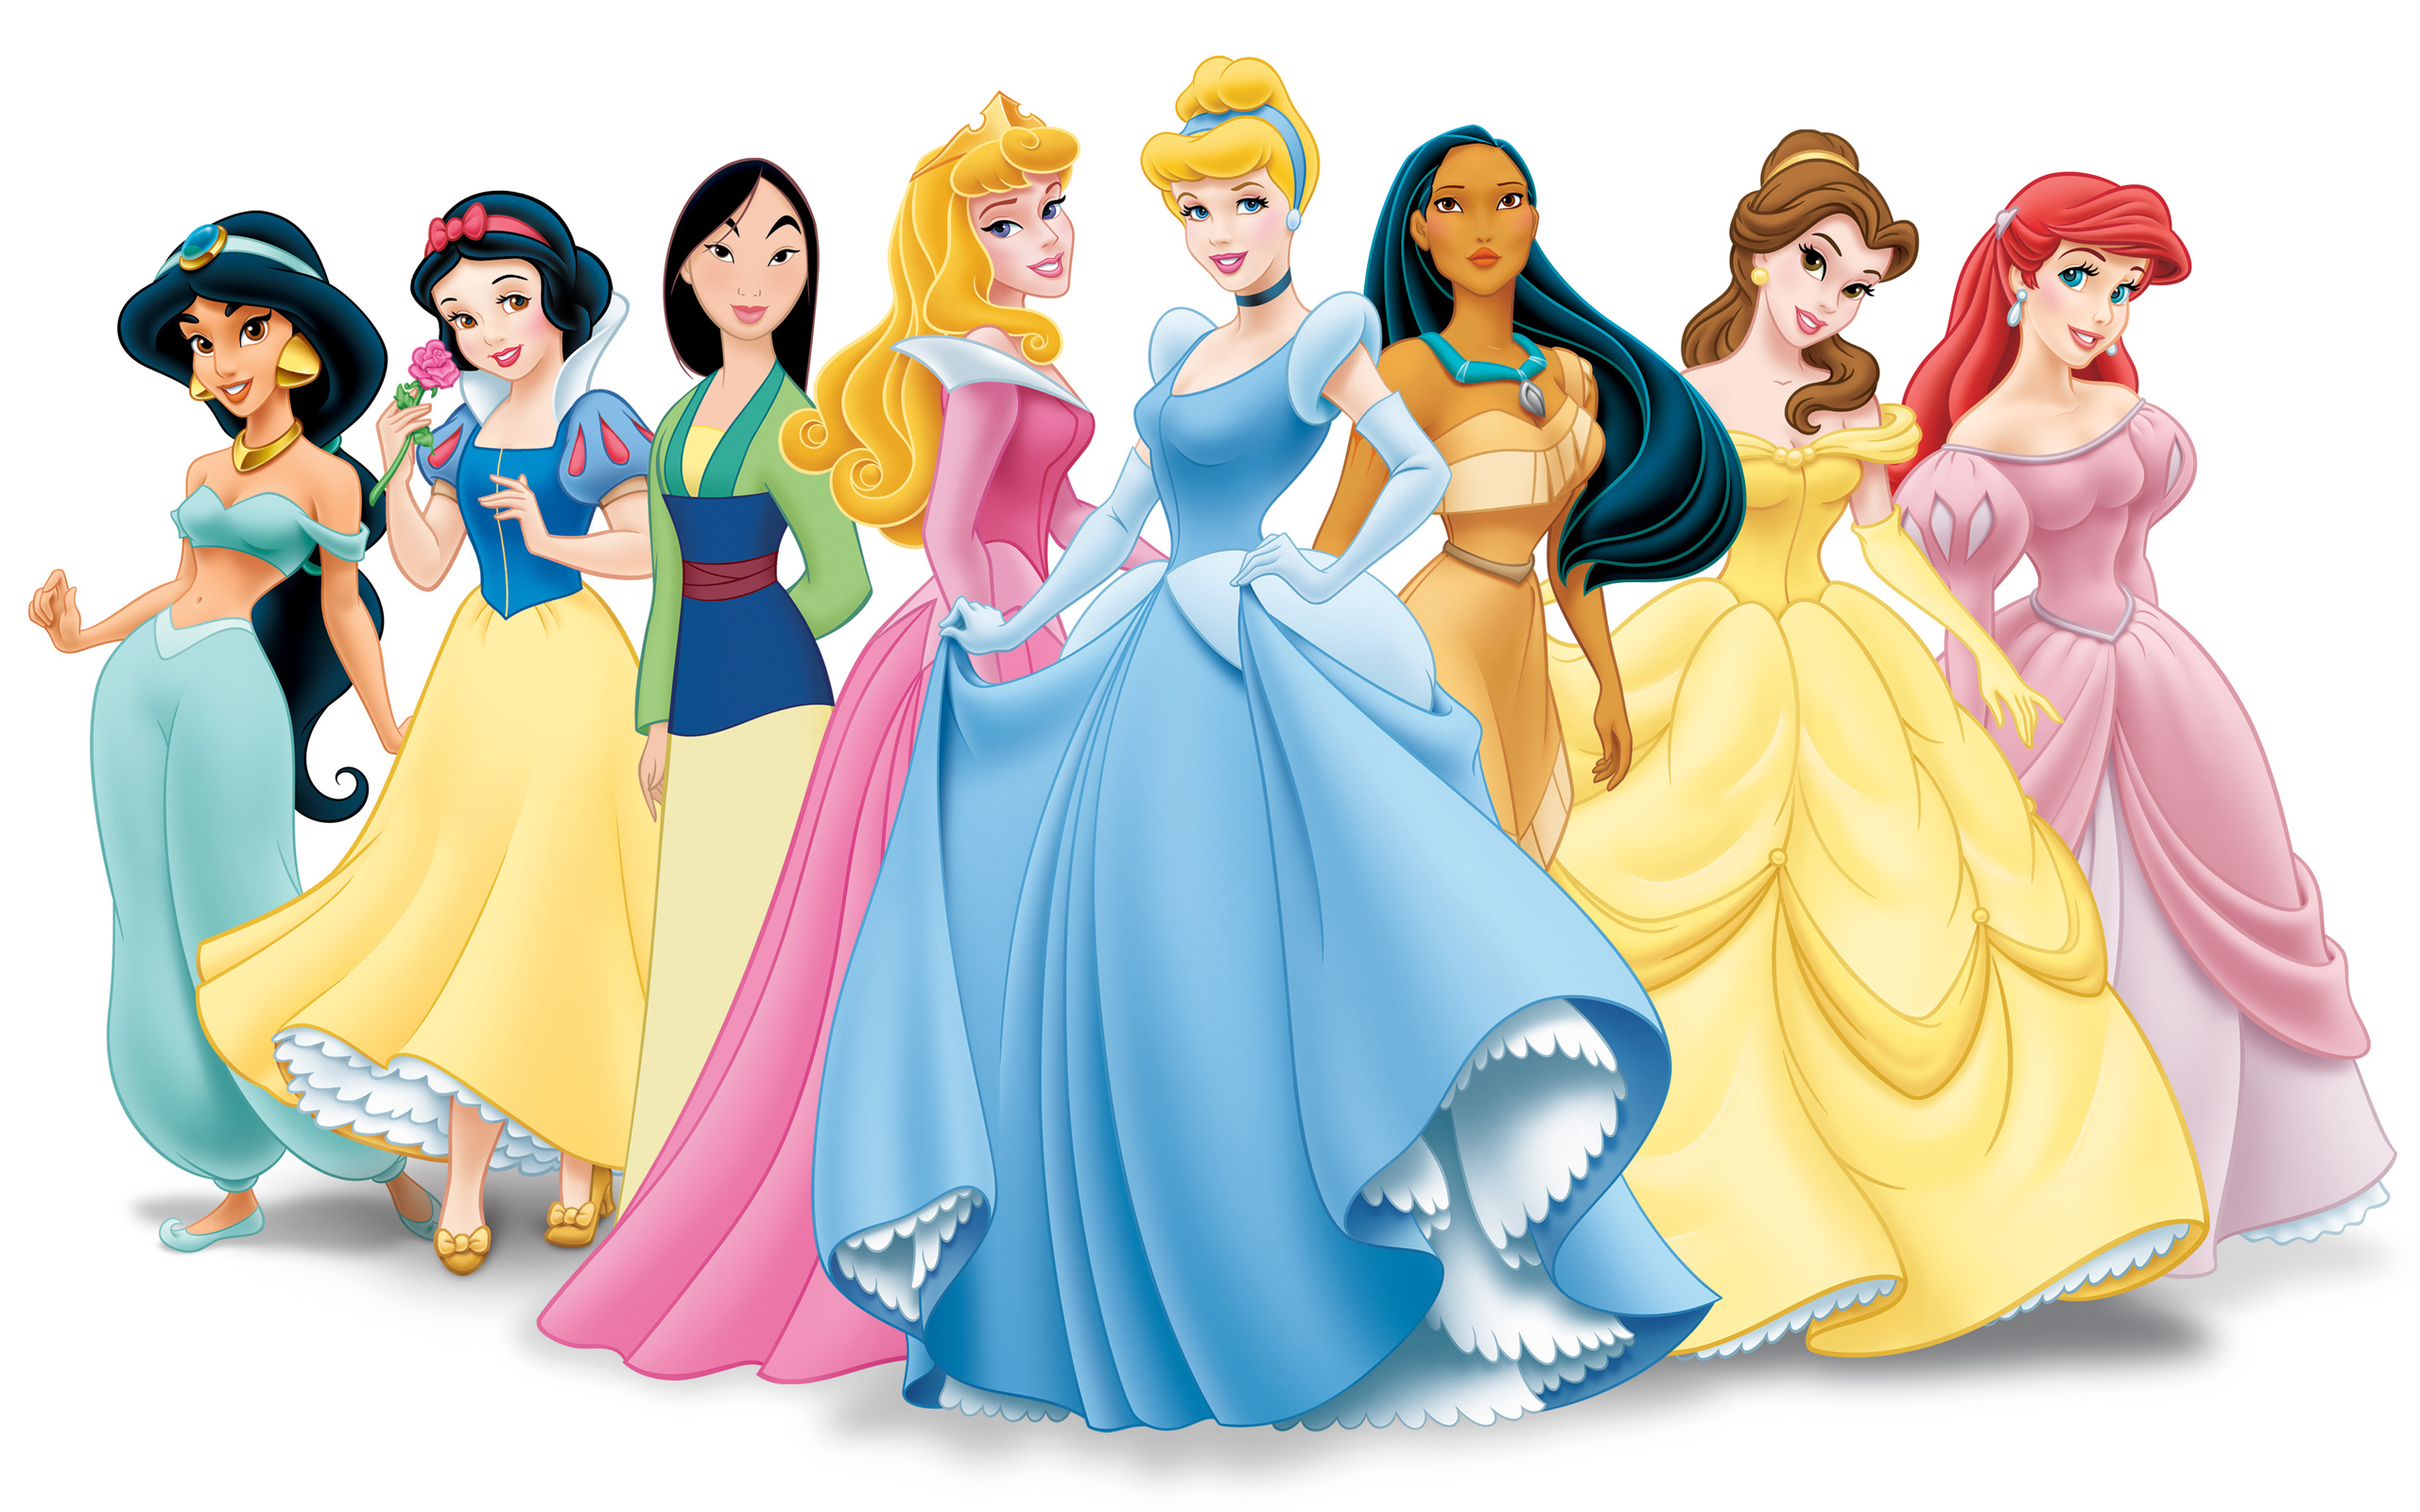 Disney Princess Wallpapers | HD Wallpapers